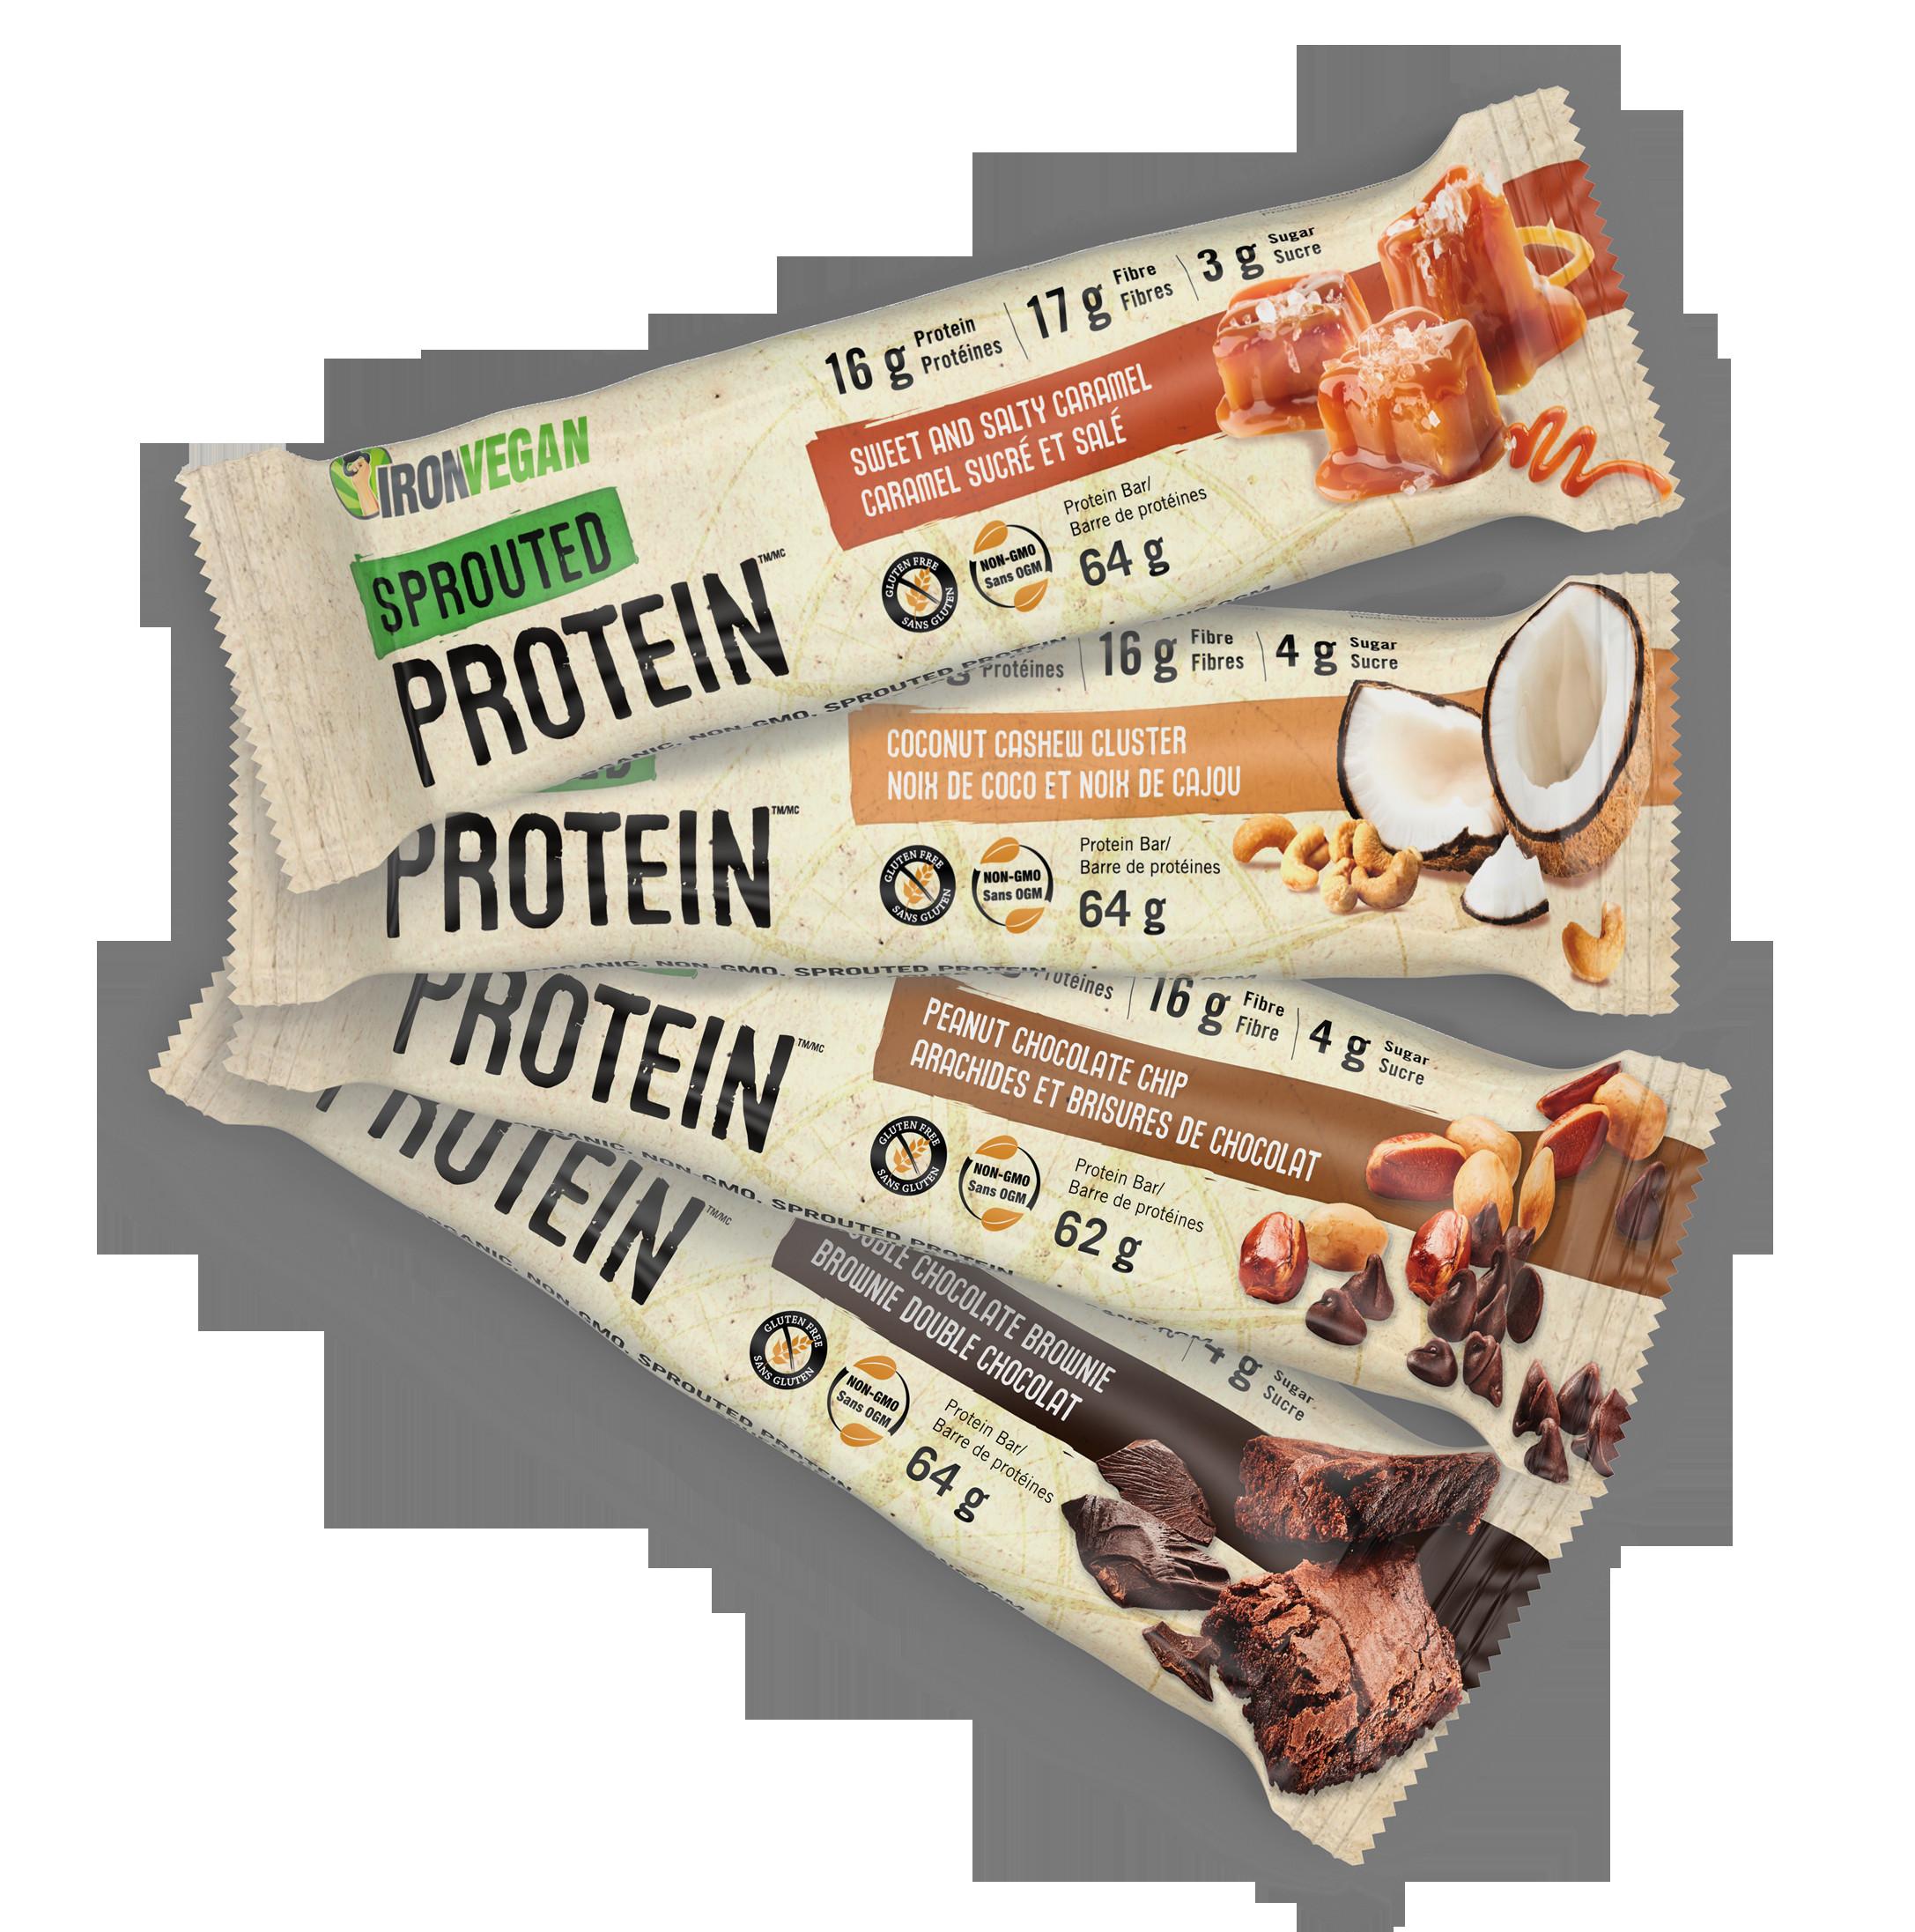 Vegan Protein Bars  Iron Vegan Protein Bars – Body Energy Club